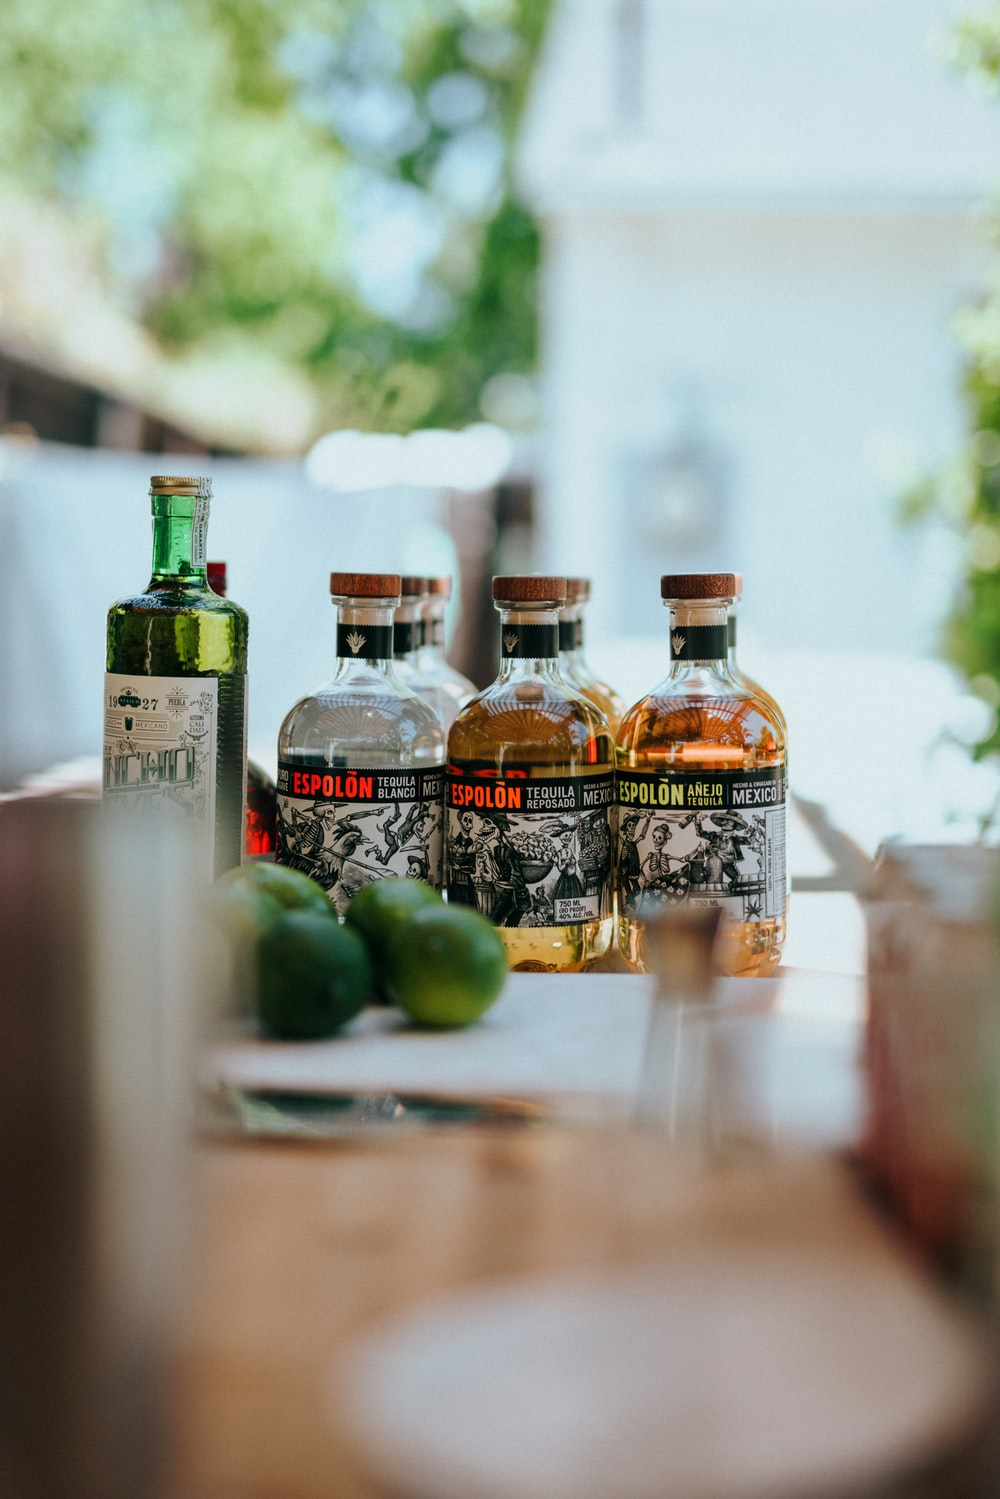 Espolòn Tequila bottles